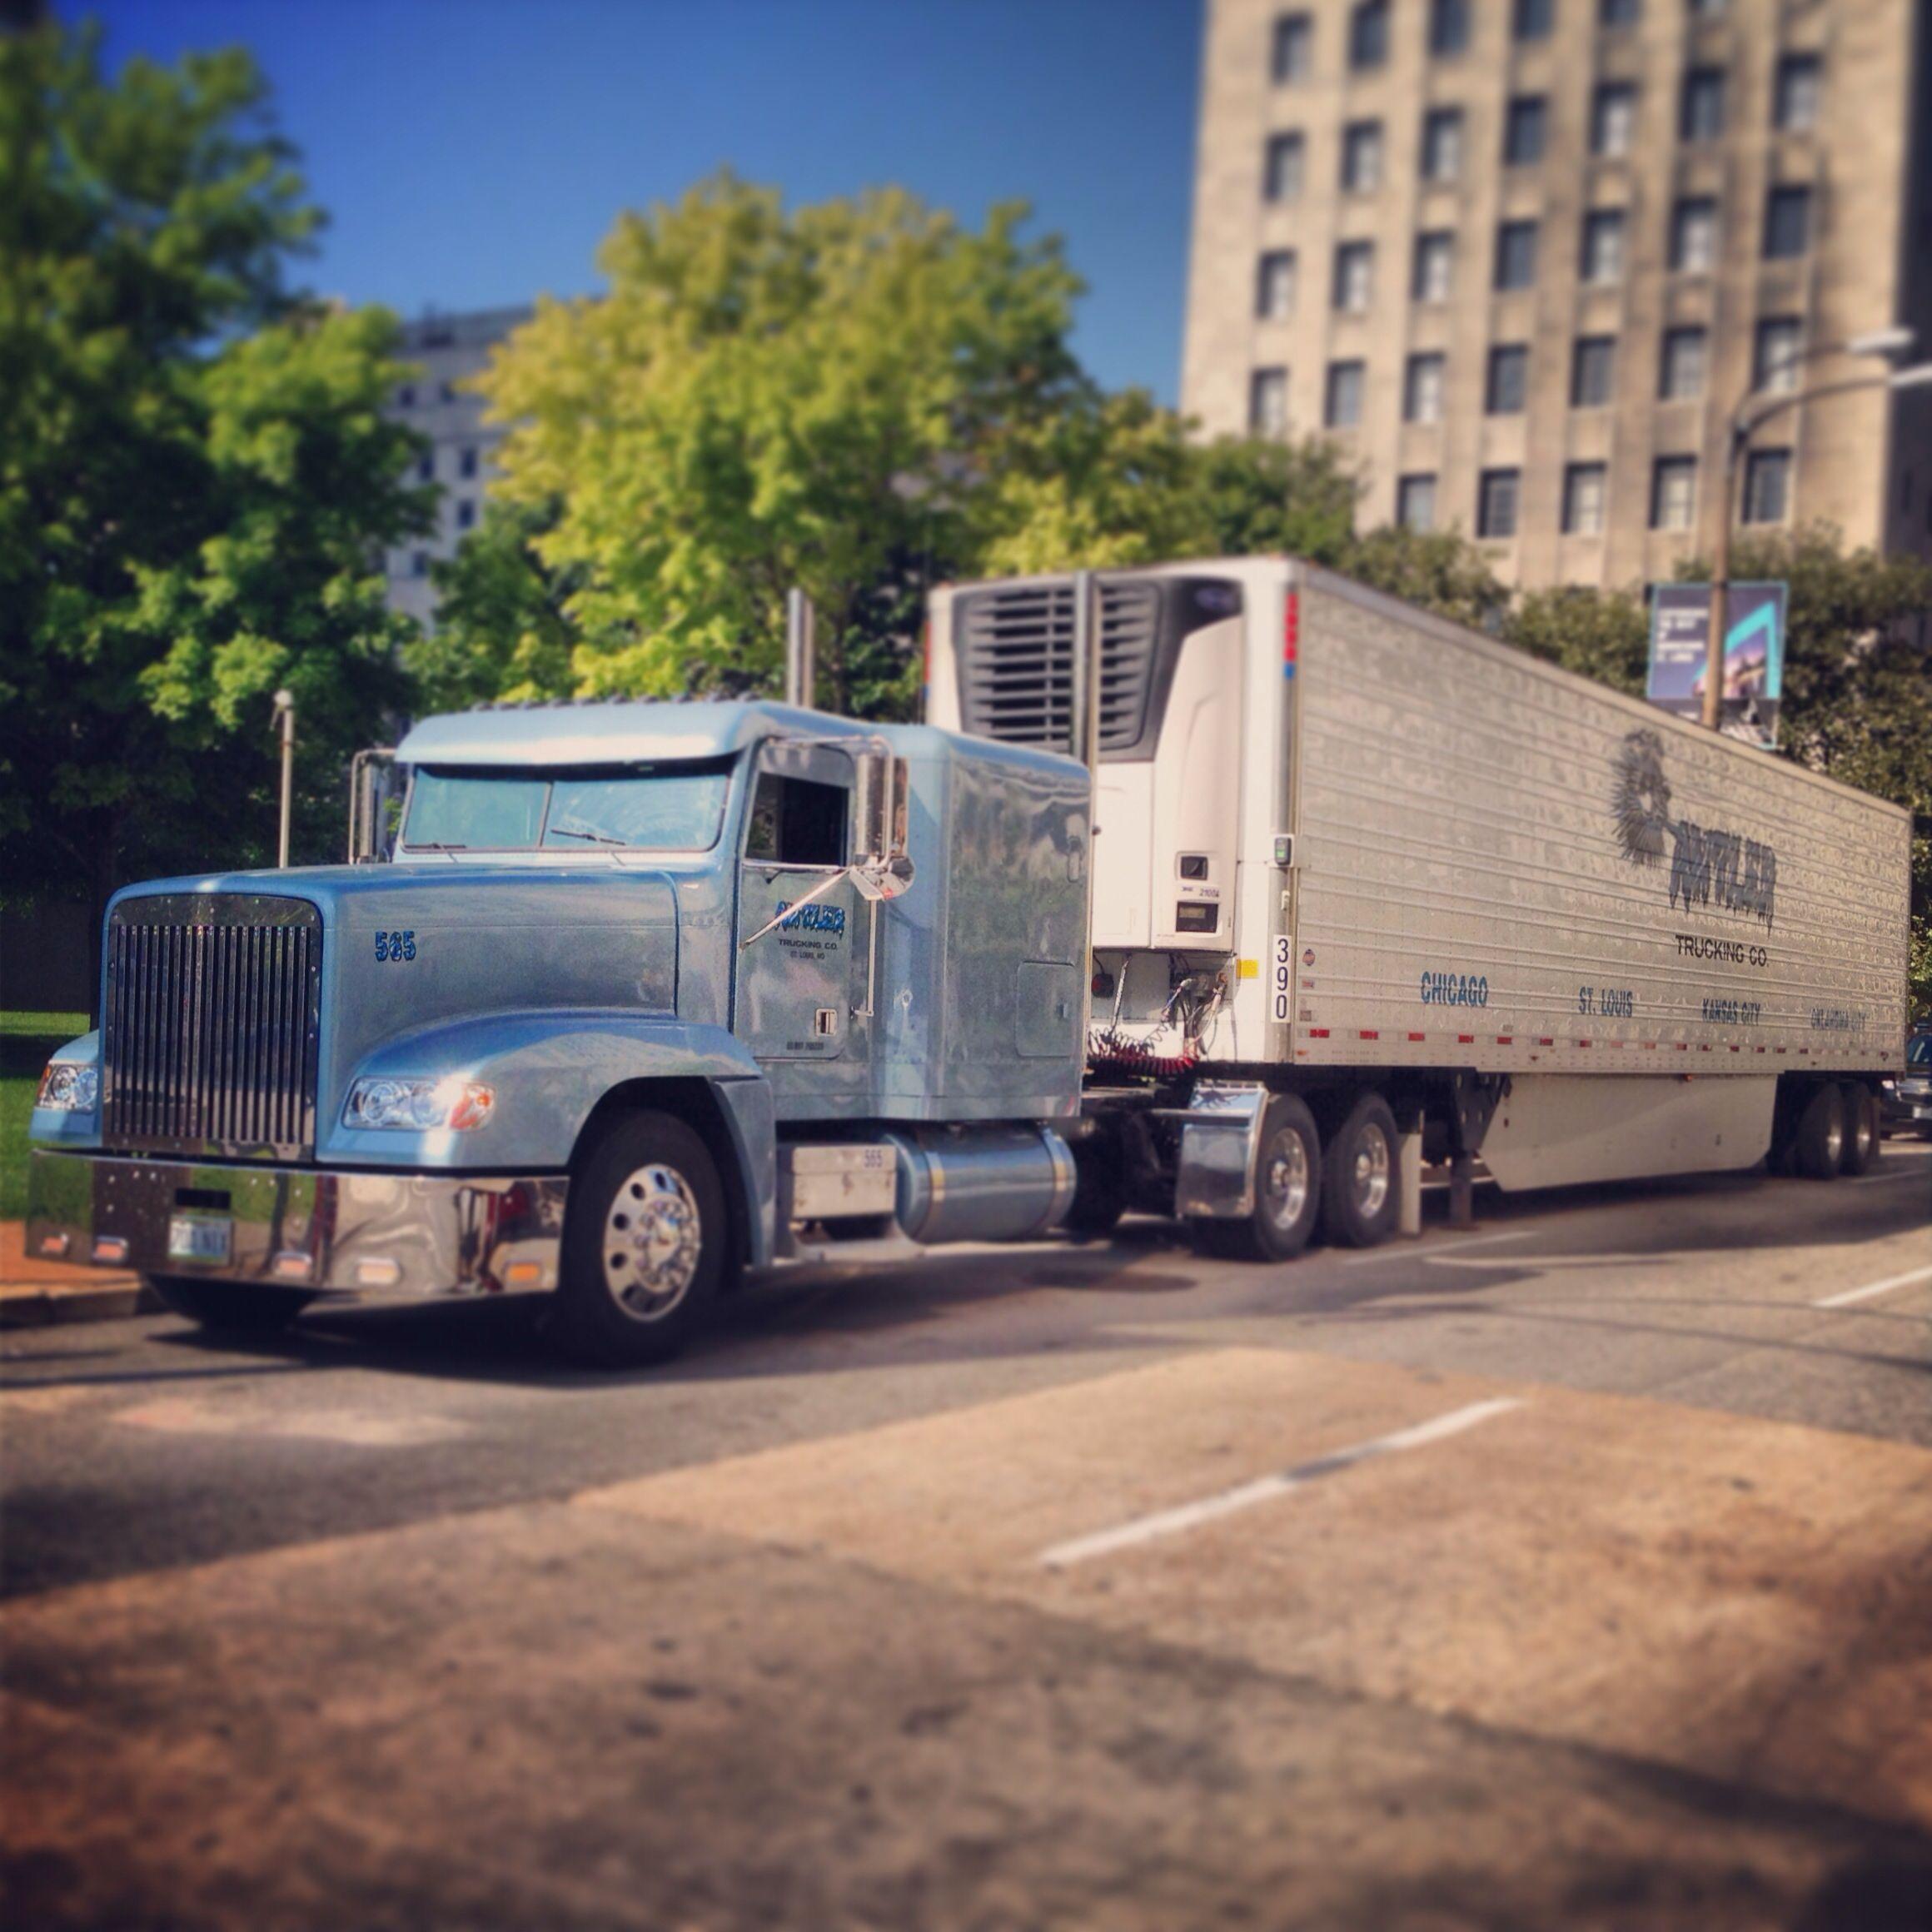 semi prices pinterest trucks pin school cdl volvo concept and supertruck driving truck biggest ferrari